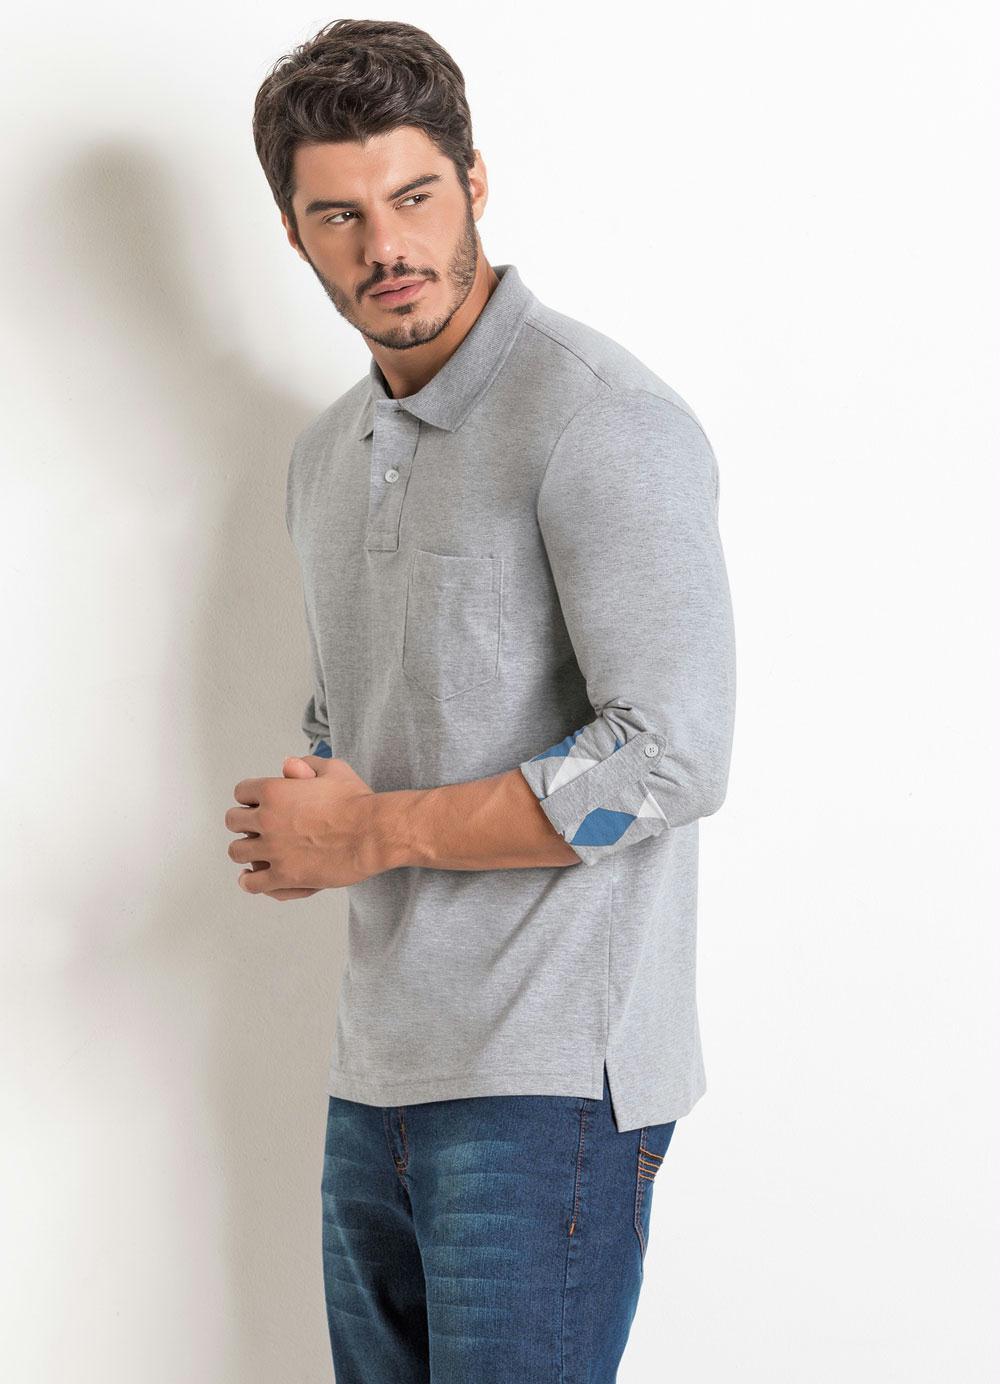 d8ad67ee2f8df Camisa Polo Manga com Estampa Interna Cinza - Actual